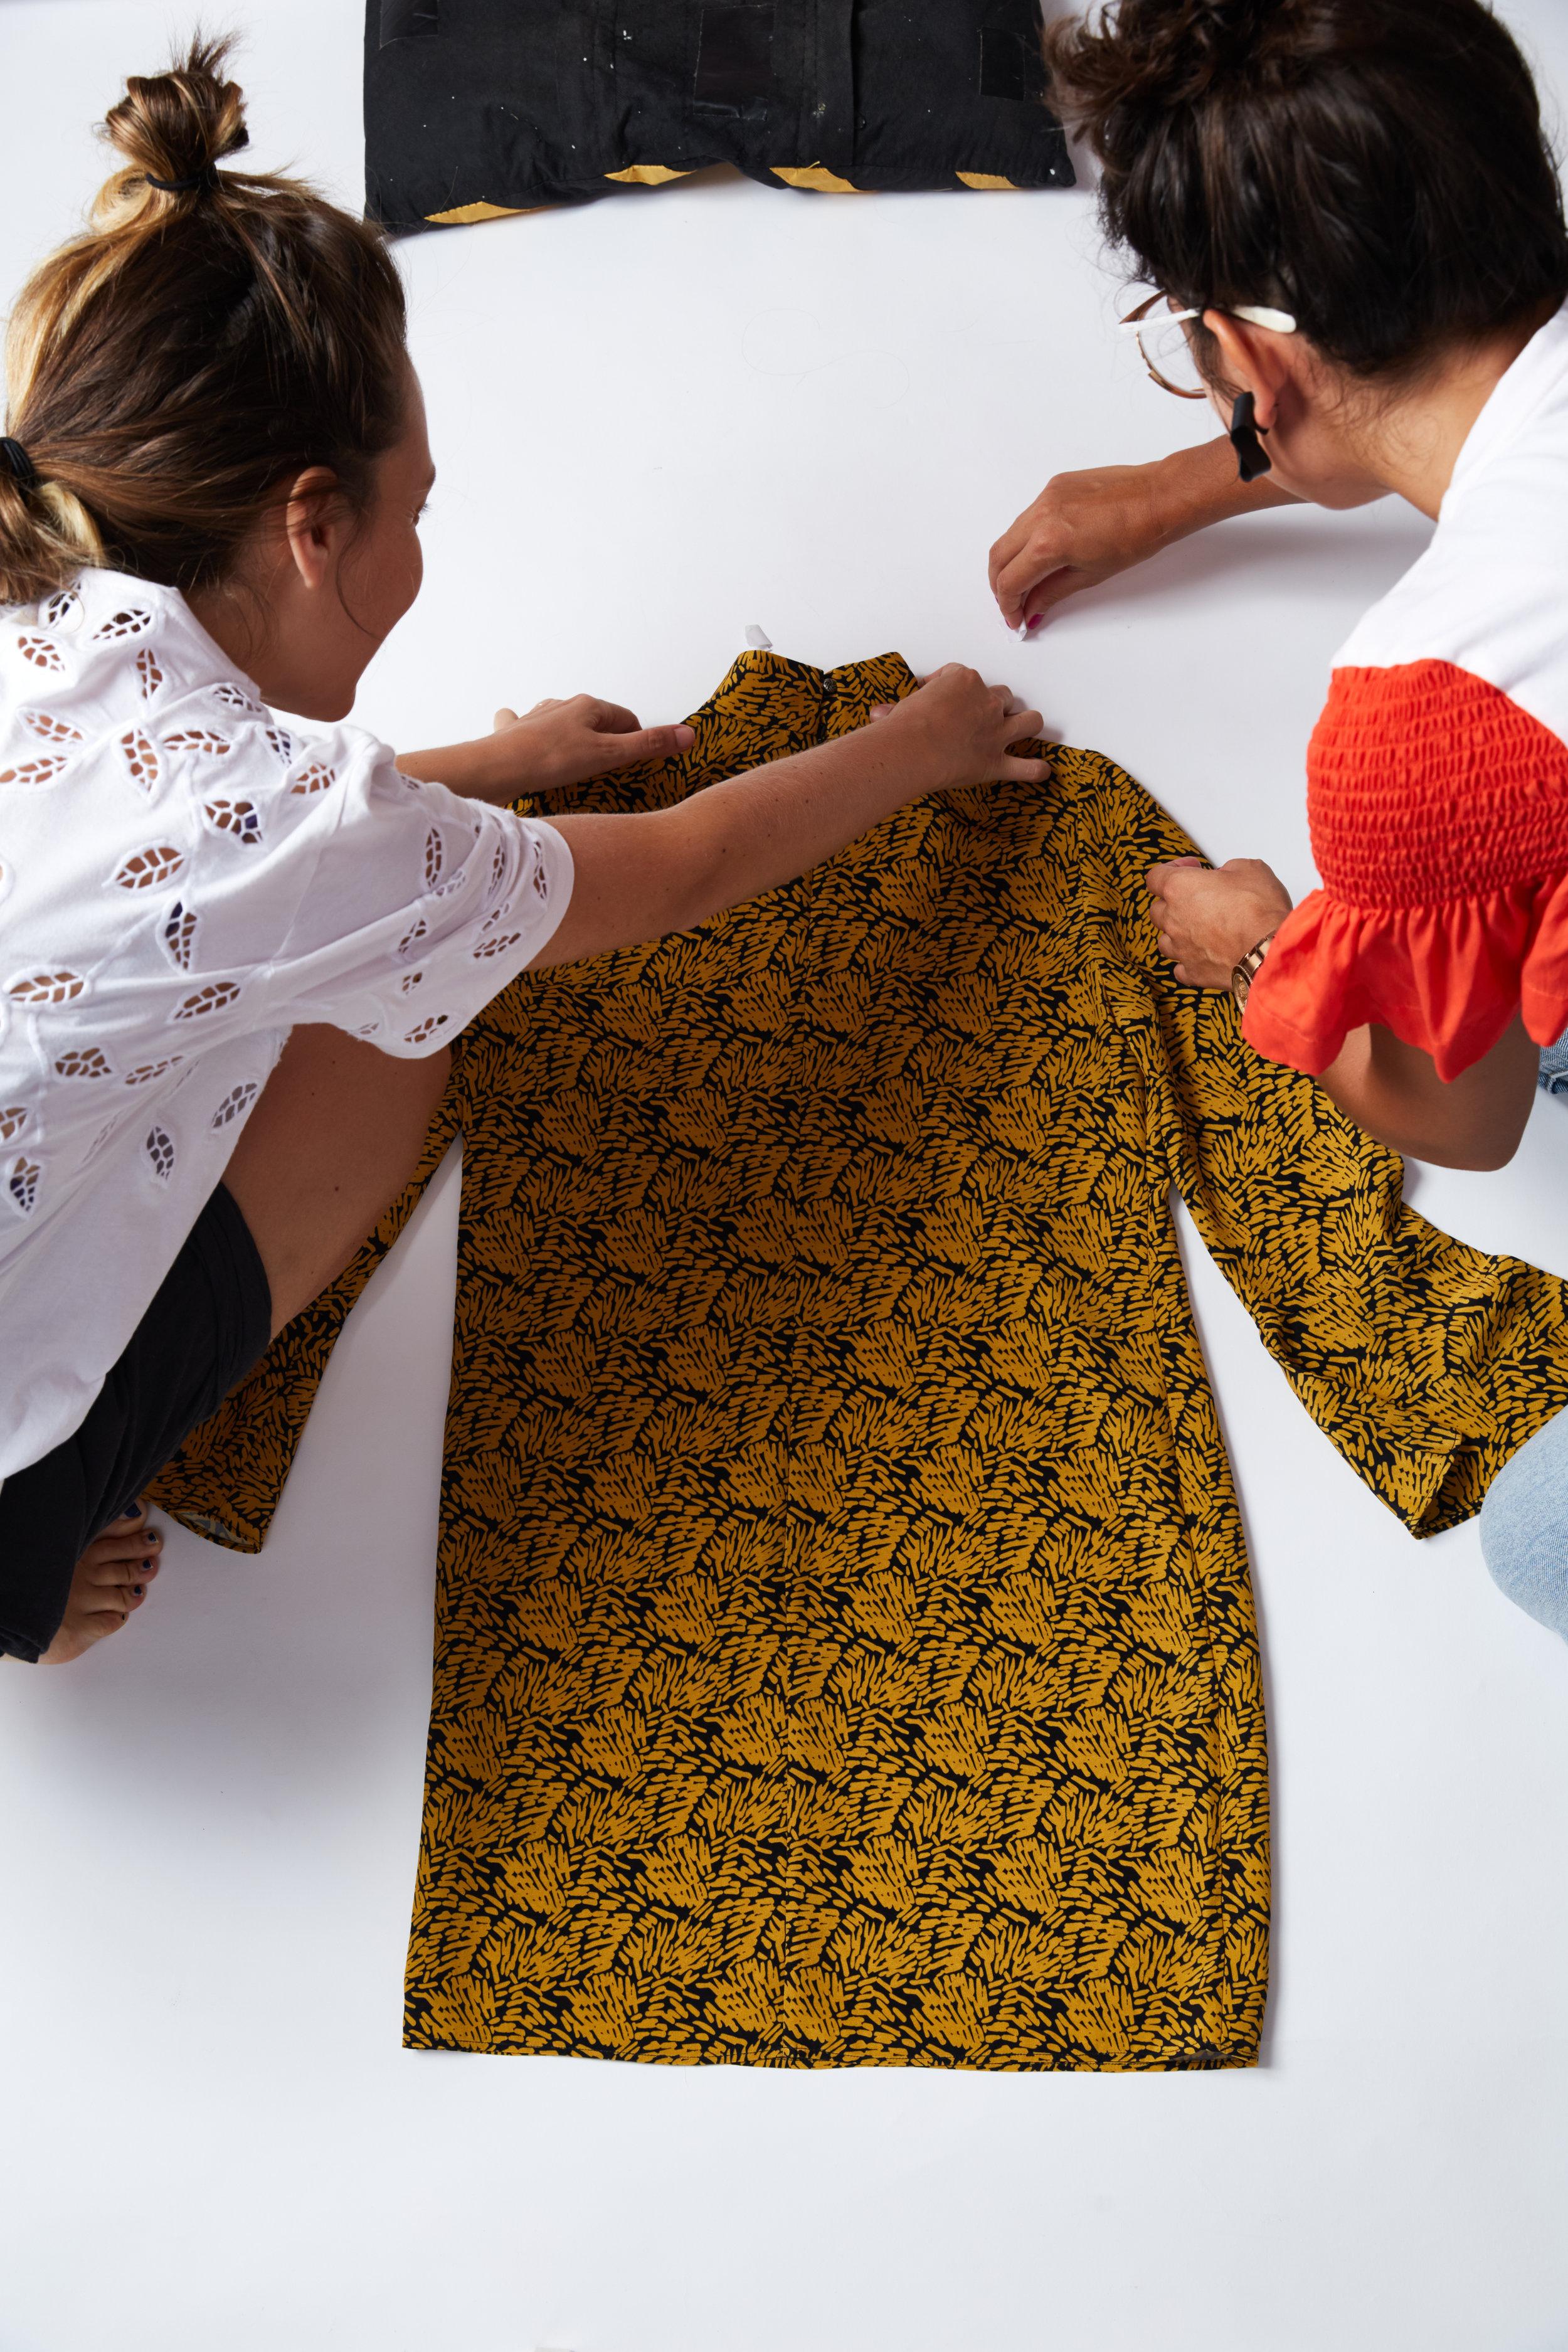 Maude & Hélène preparing the style for the pack shoot